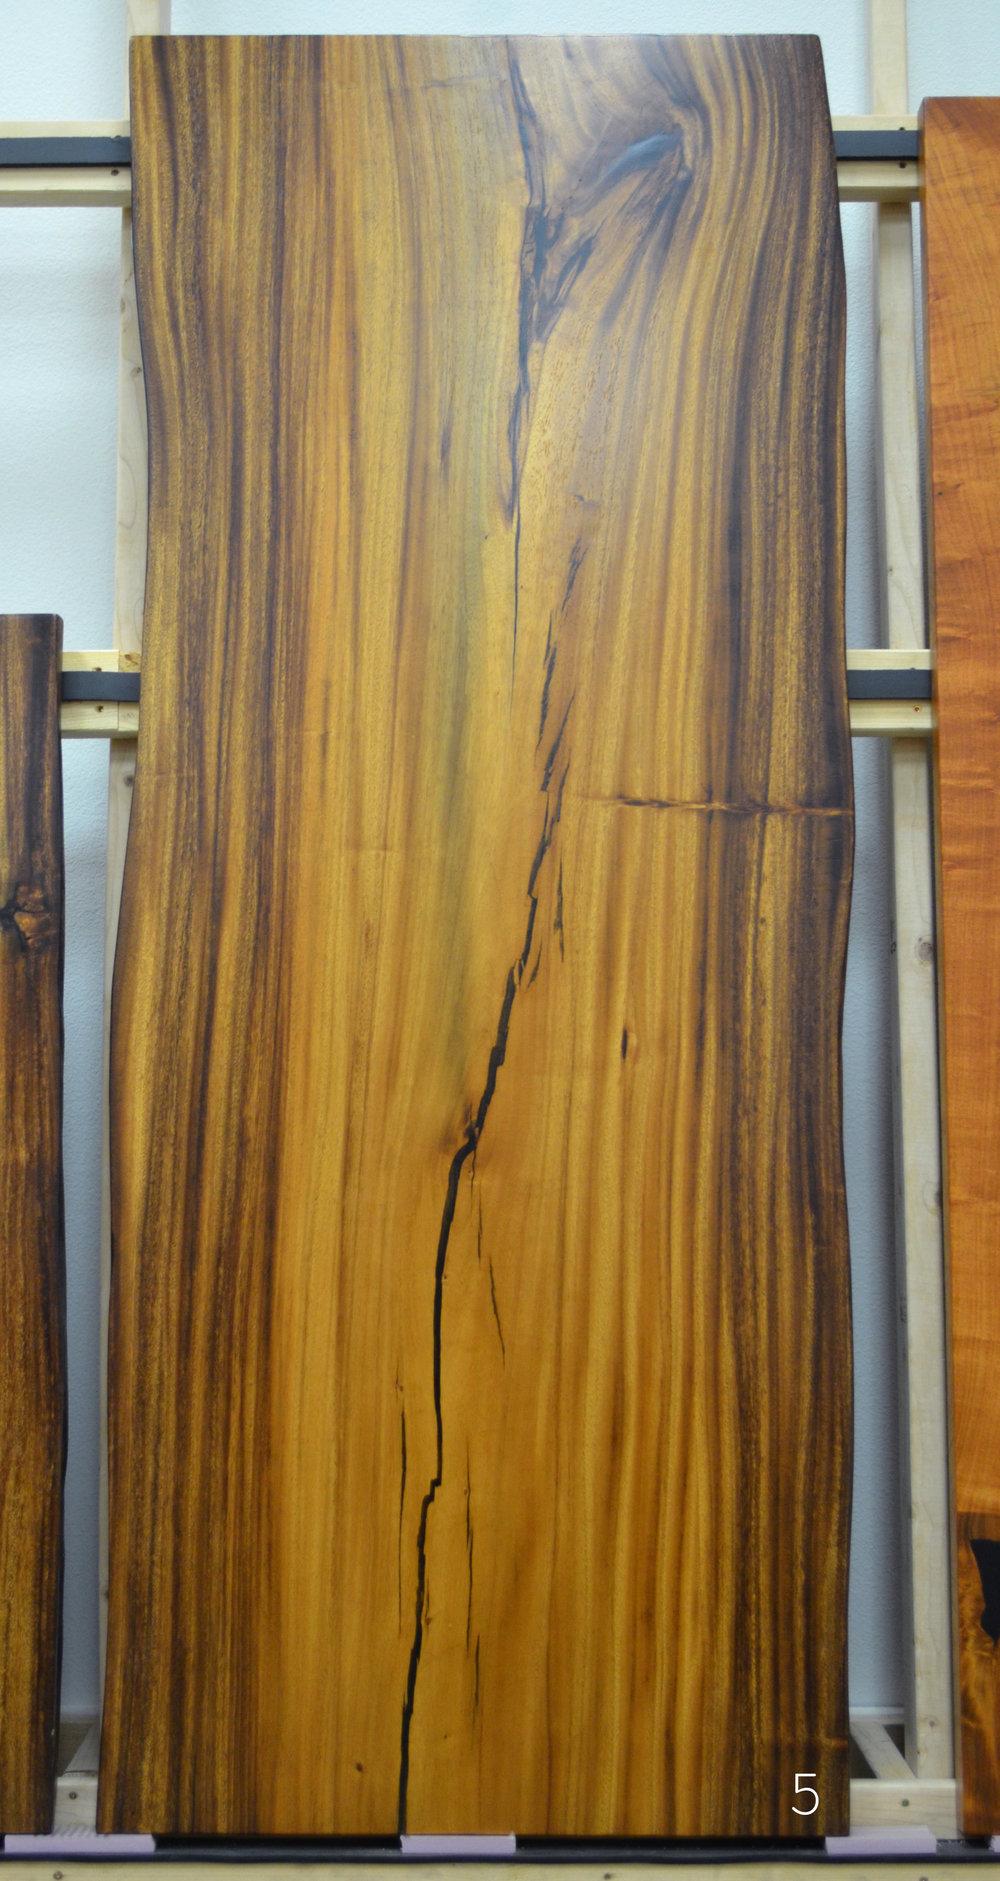 Large Natural edge wood slab - Koa